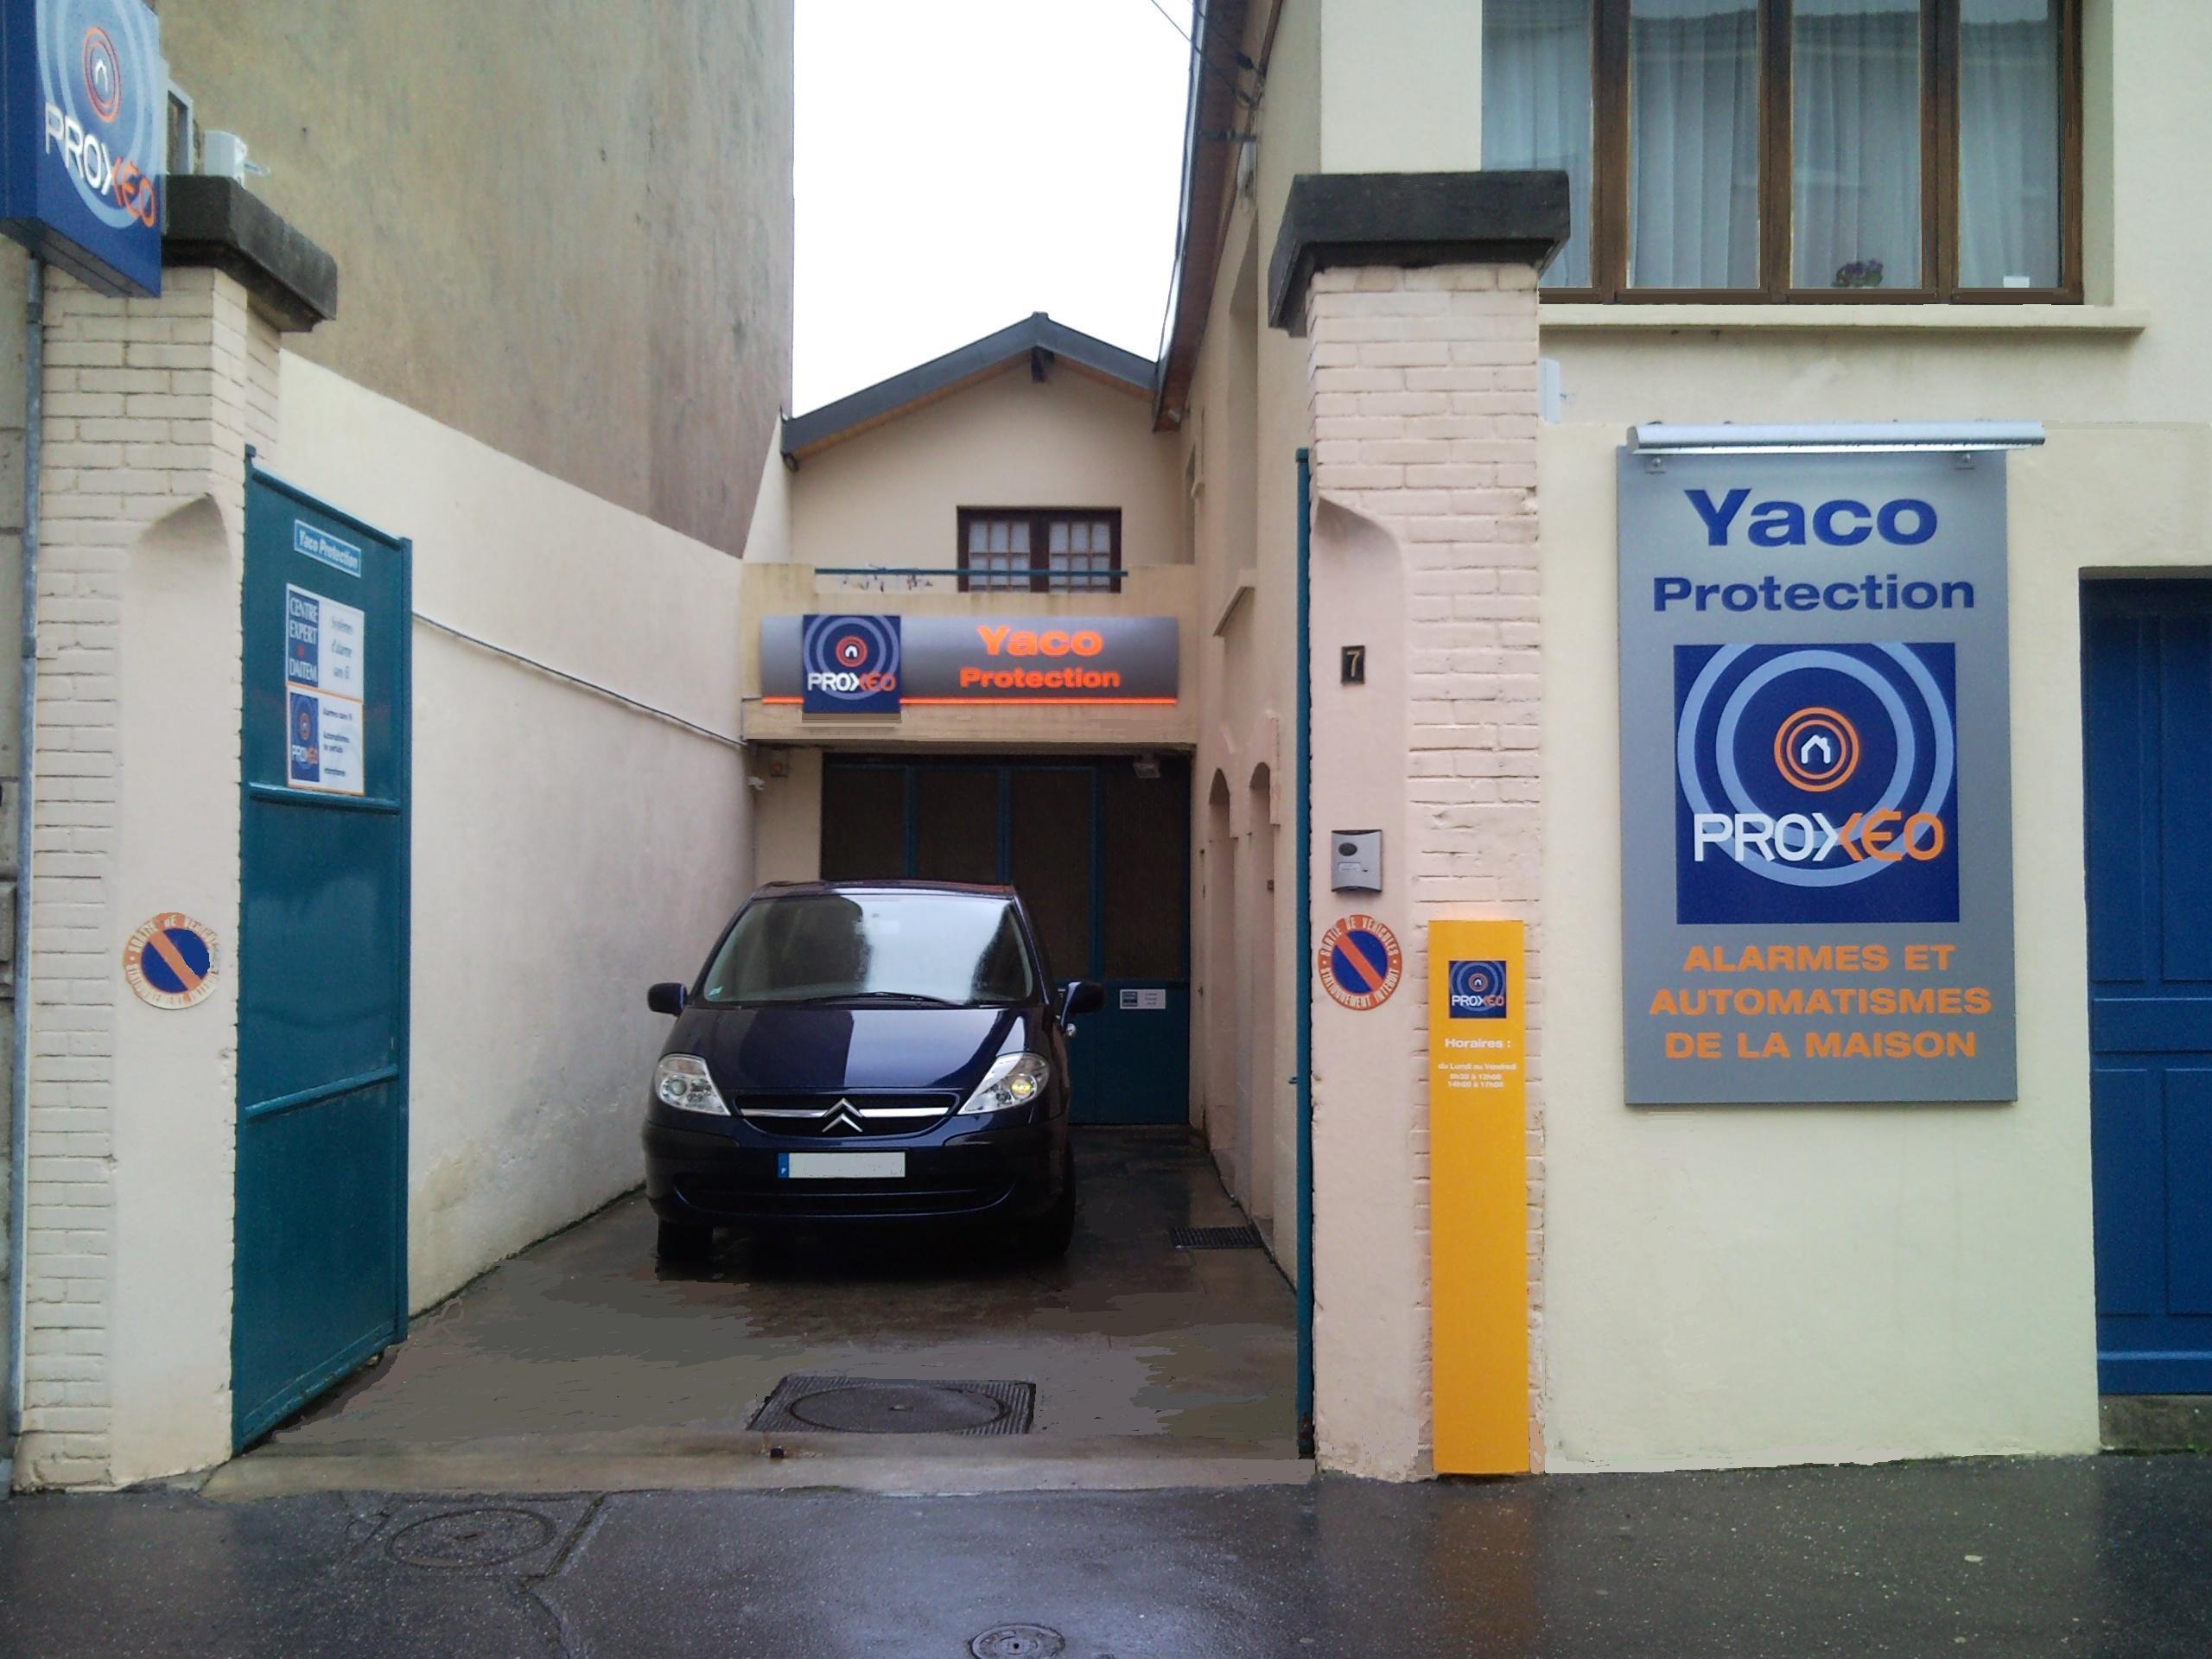 Yaco Protection 54